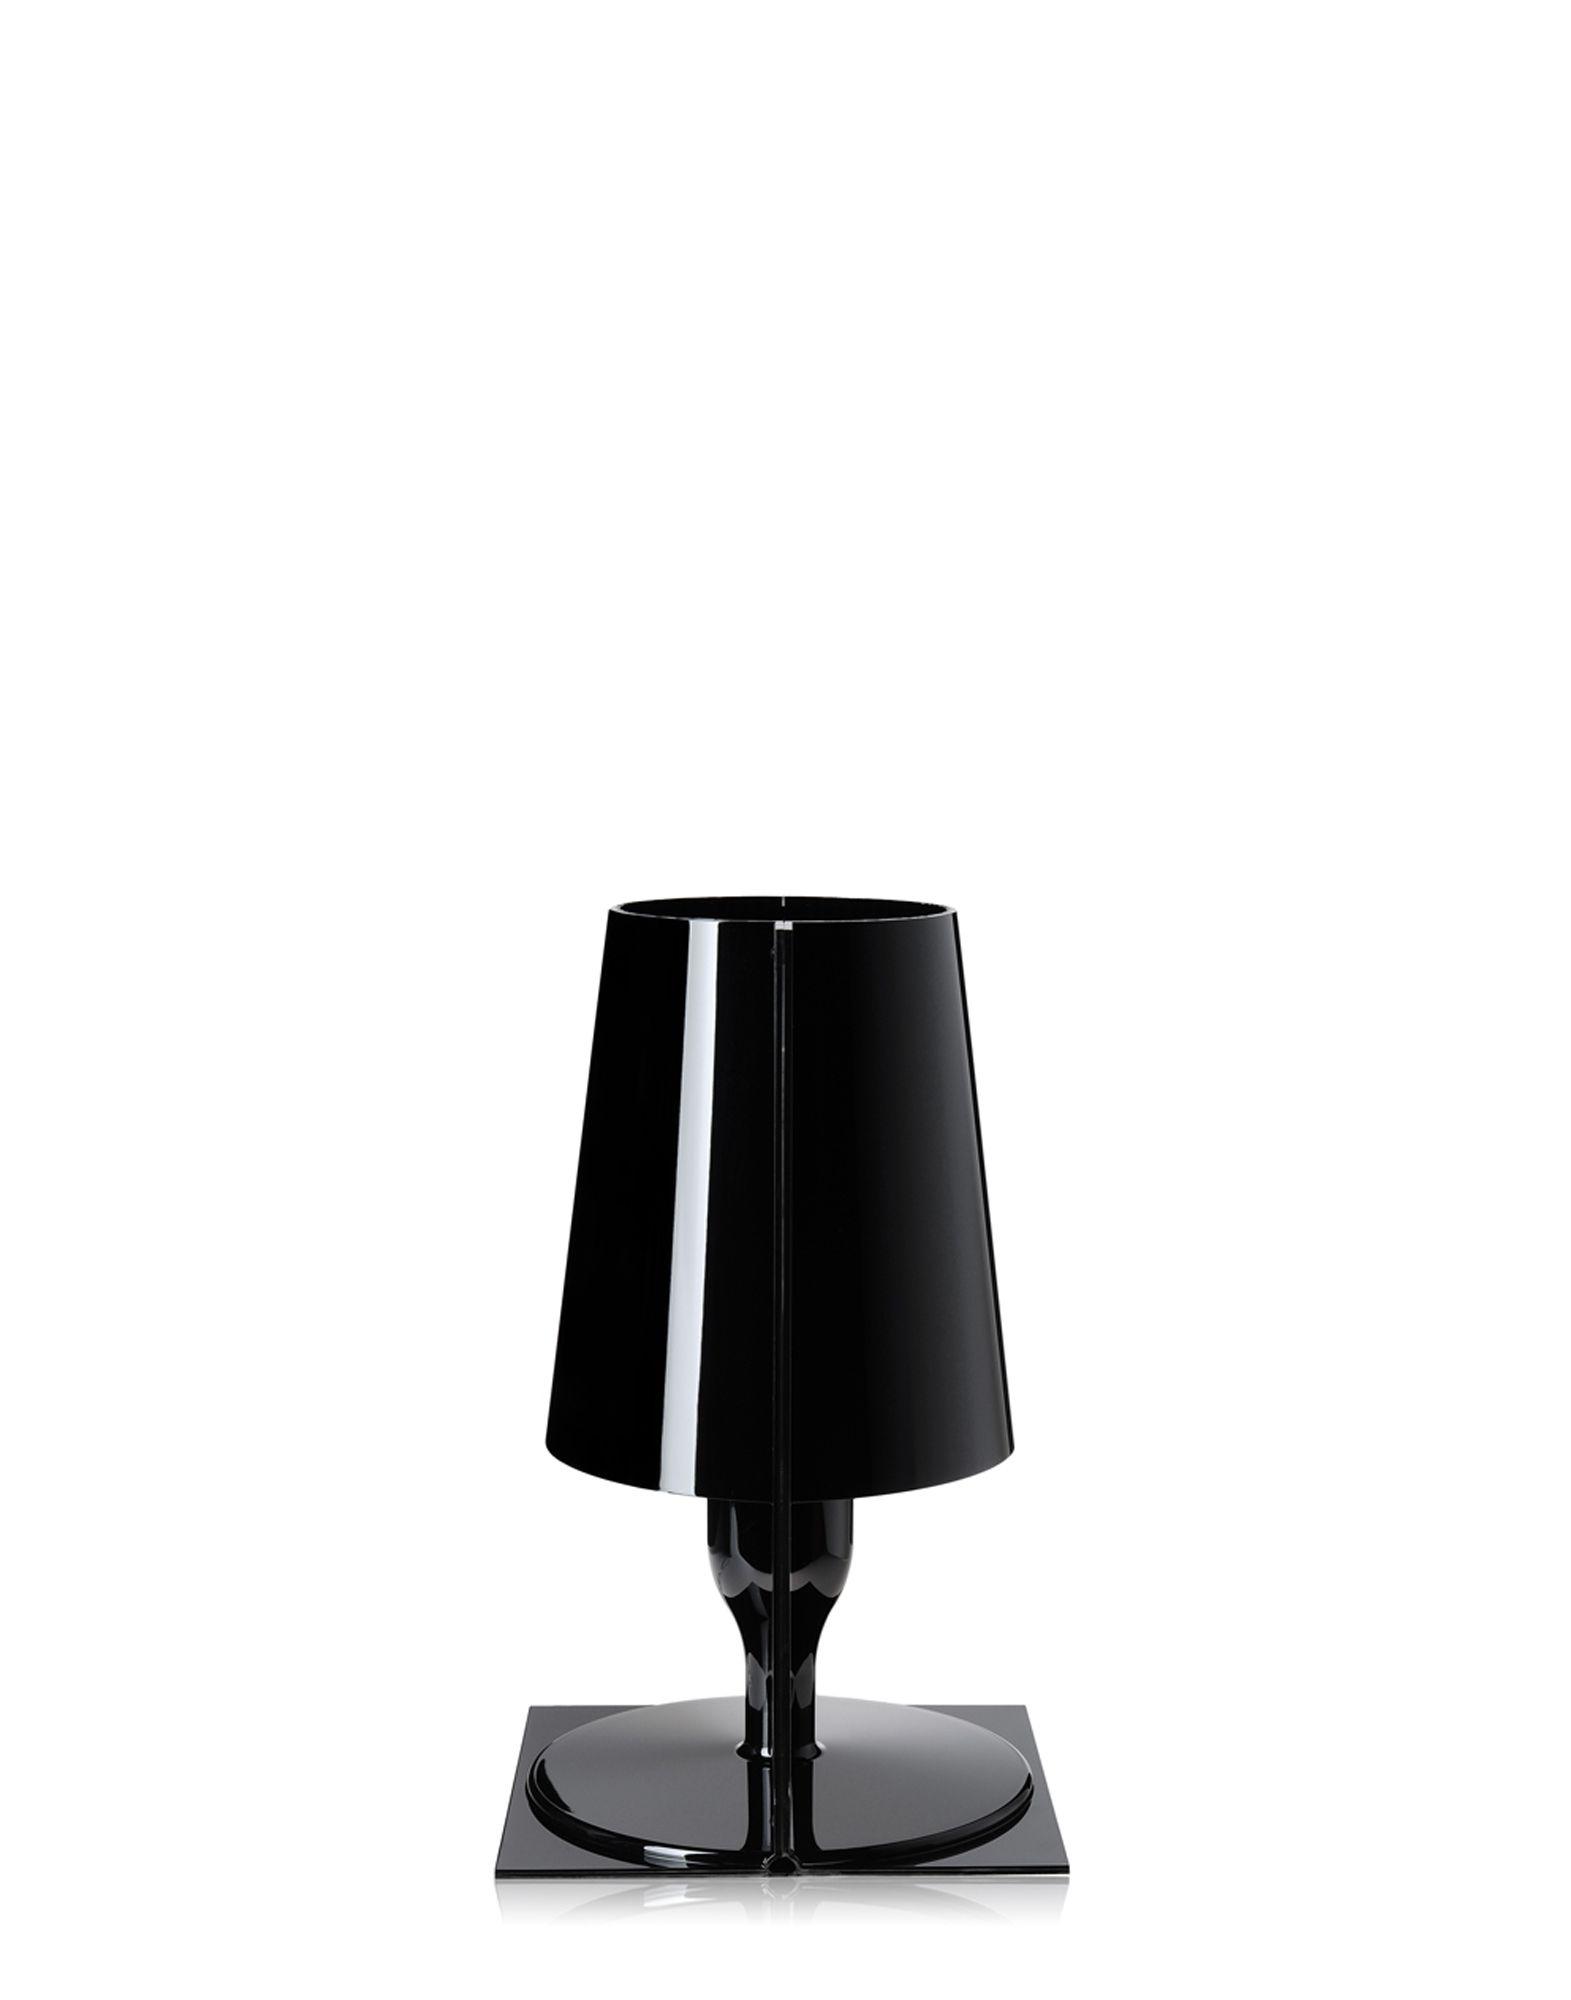 Kartell lampada da tavolo take nero newformsdesign - Lampade kartell da tavolo ...